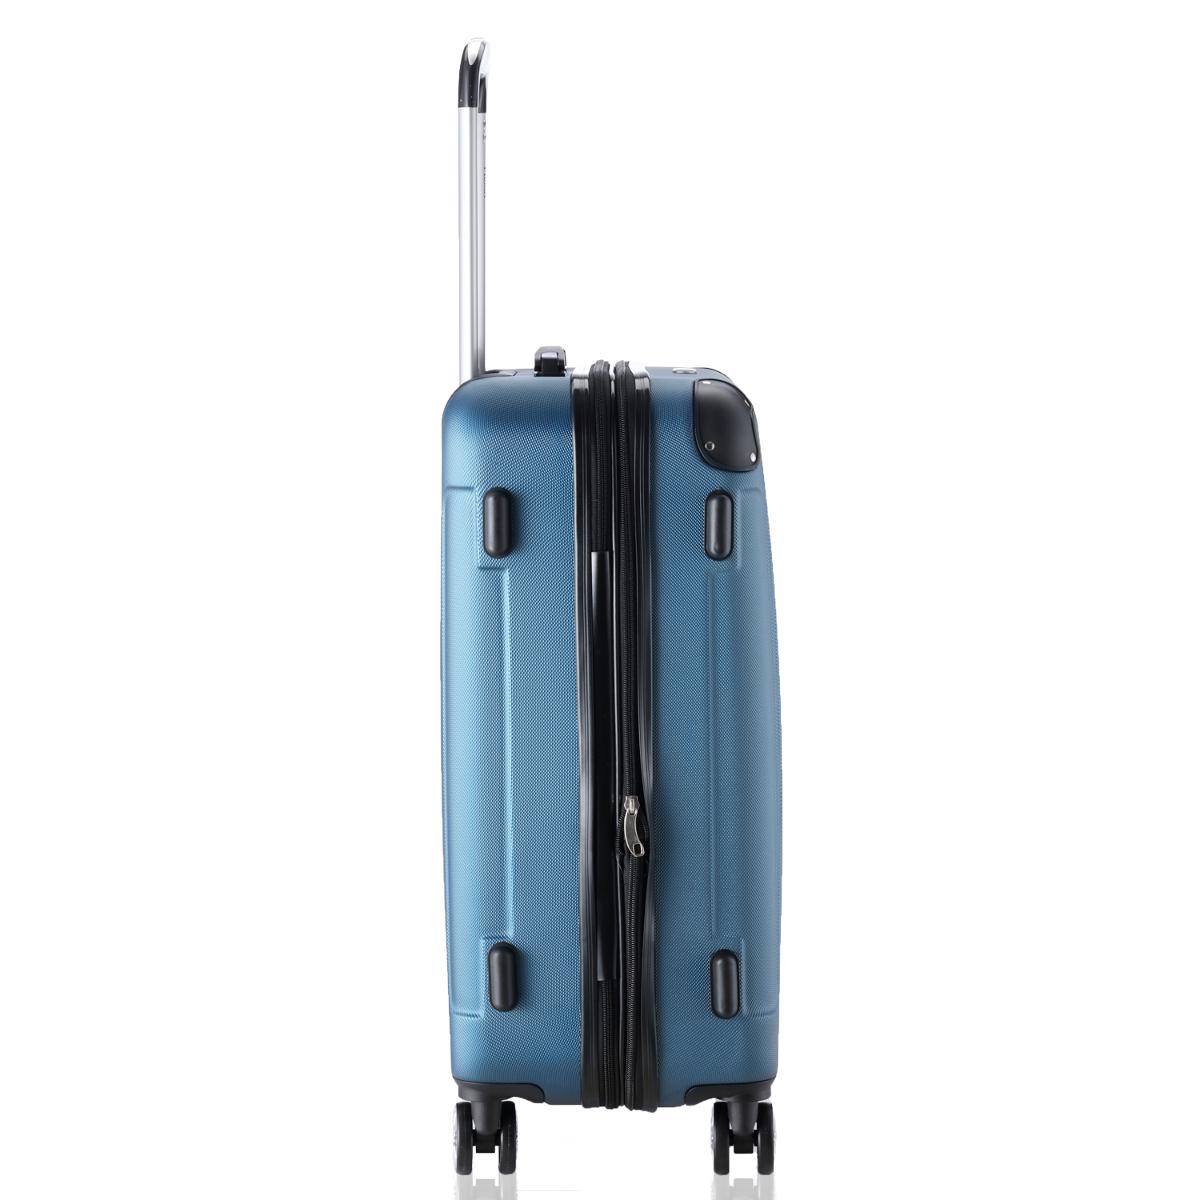 Koffer-Flexot-2045-Hartschalenkoffer-Trolley-Kofferset-Reisekoffer-M-L-XL-Set Indexbild 15